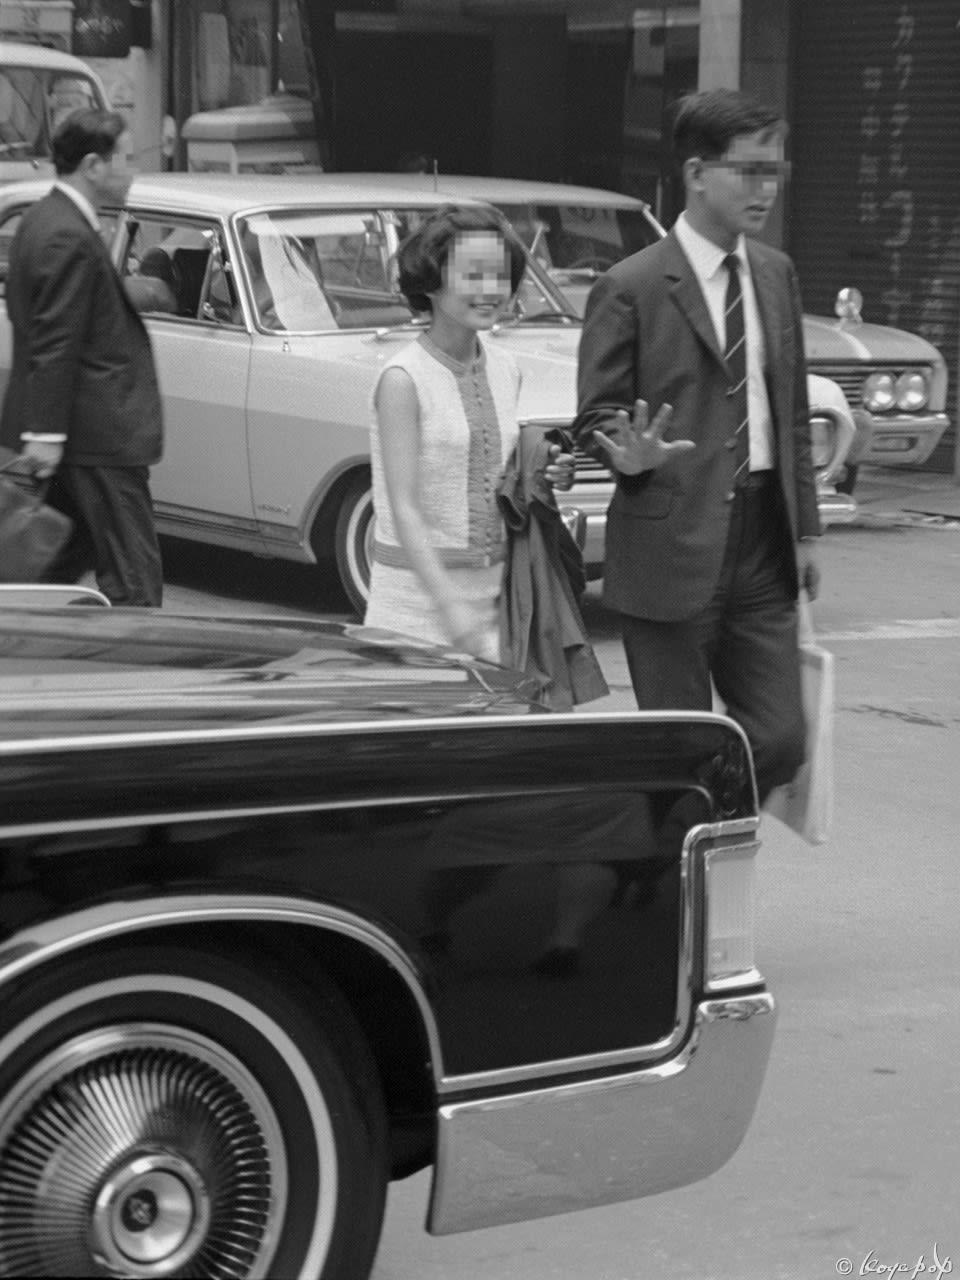 Lincoln Continental 1968 -02 1968年型リンカーン コンチネンタル ...